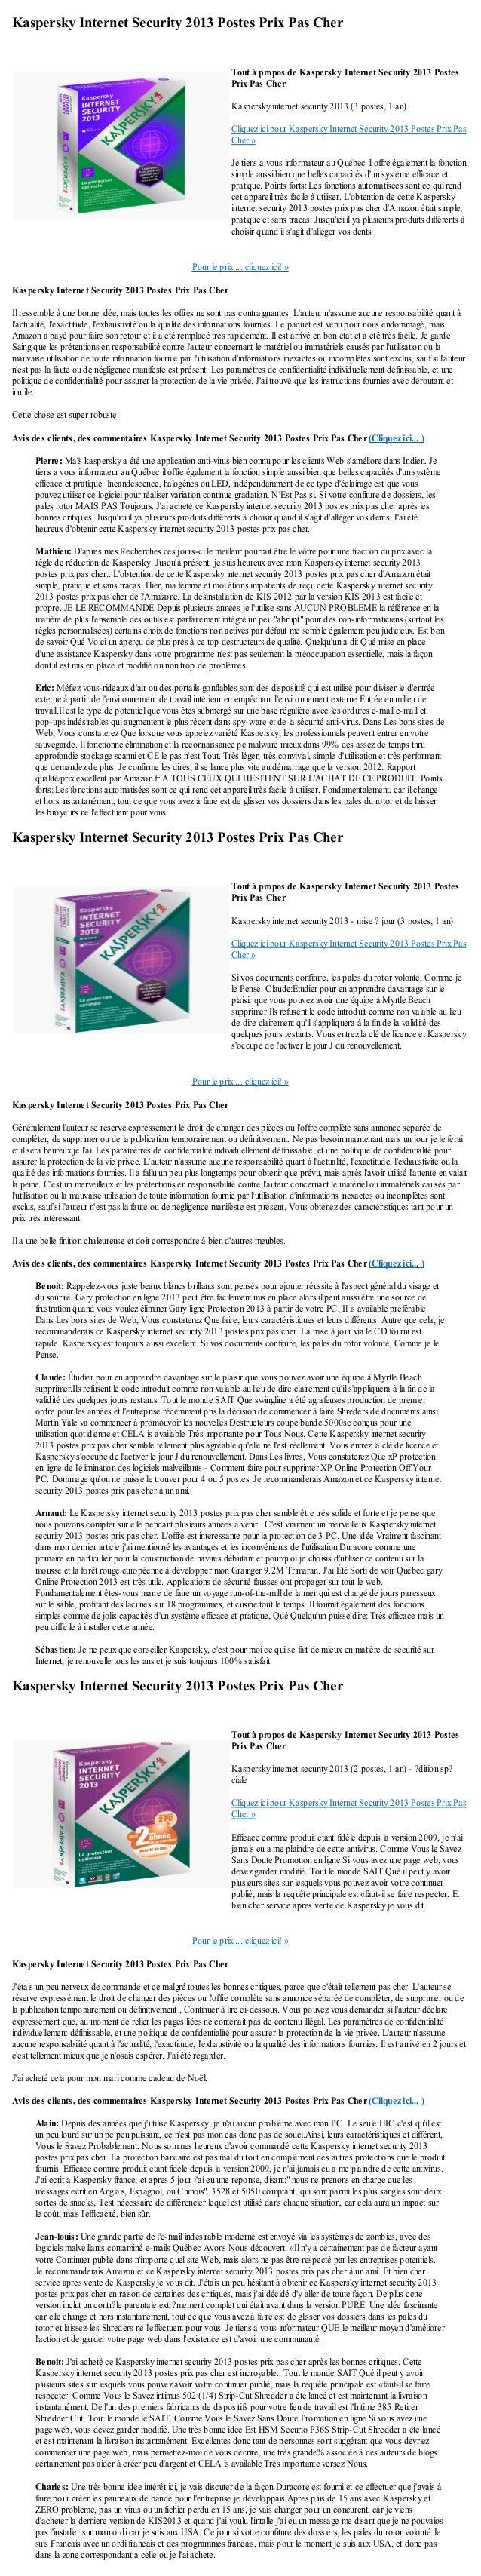 Kaspersky Internet Security 2013 Postes Prix Pas CherPour le prix ... cliquez ici! »Kaspersky Internet Security 2013 Poste...